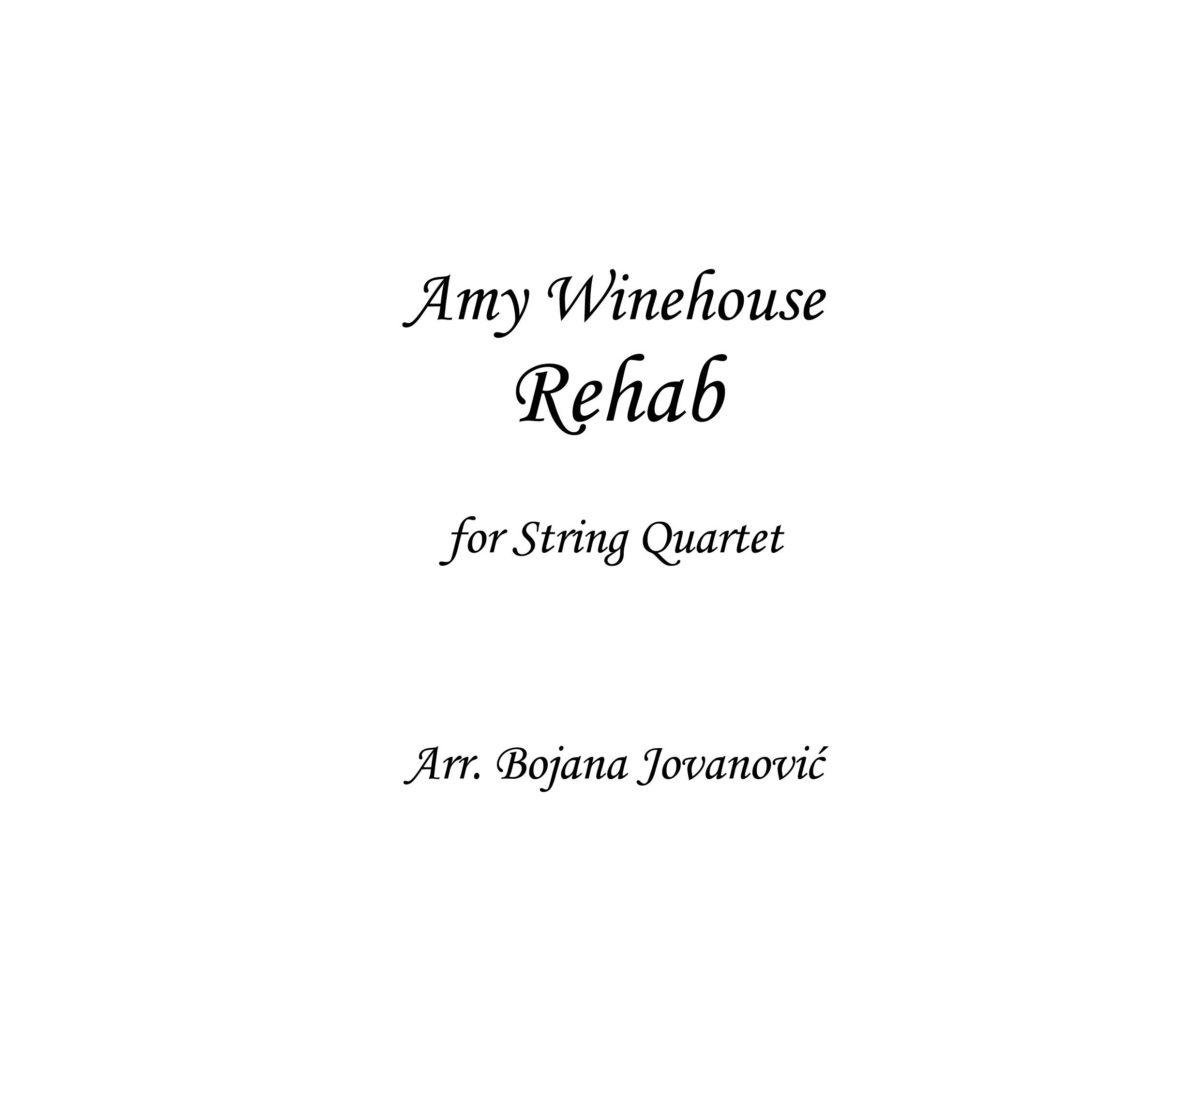 Rehab (Amy Winehouse) - Sheet Music